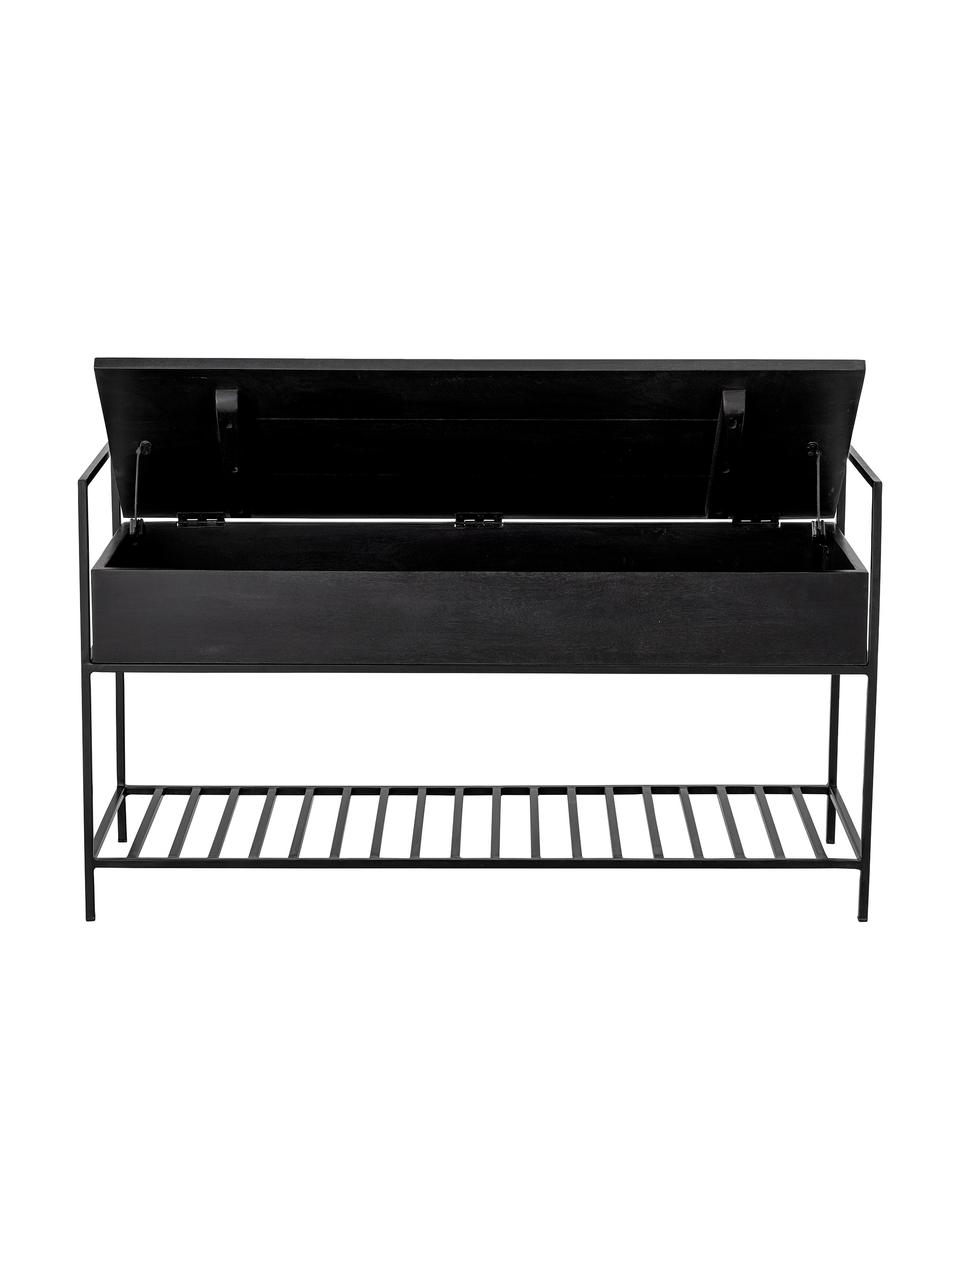 Garderobenbank Abelone mit Stauraum, Sitzfläche: Mangoholz, beschichtet, Gestell: Metall, beschichtet, Schwarz, B 102 x T 40 cm